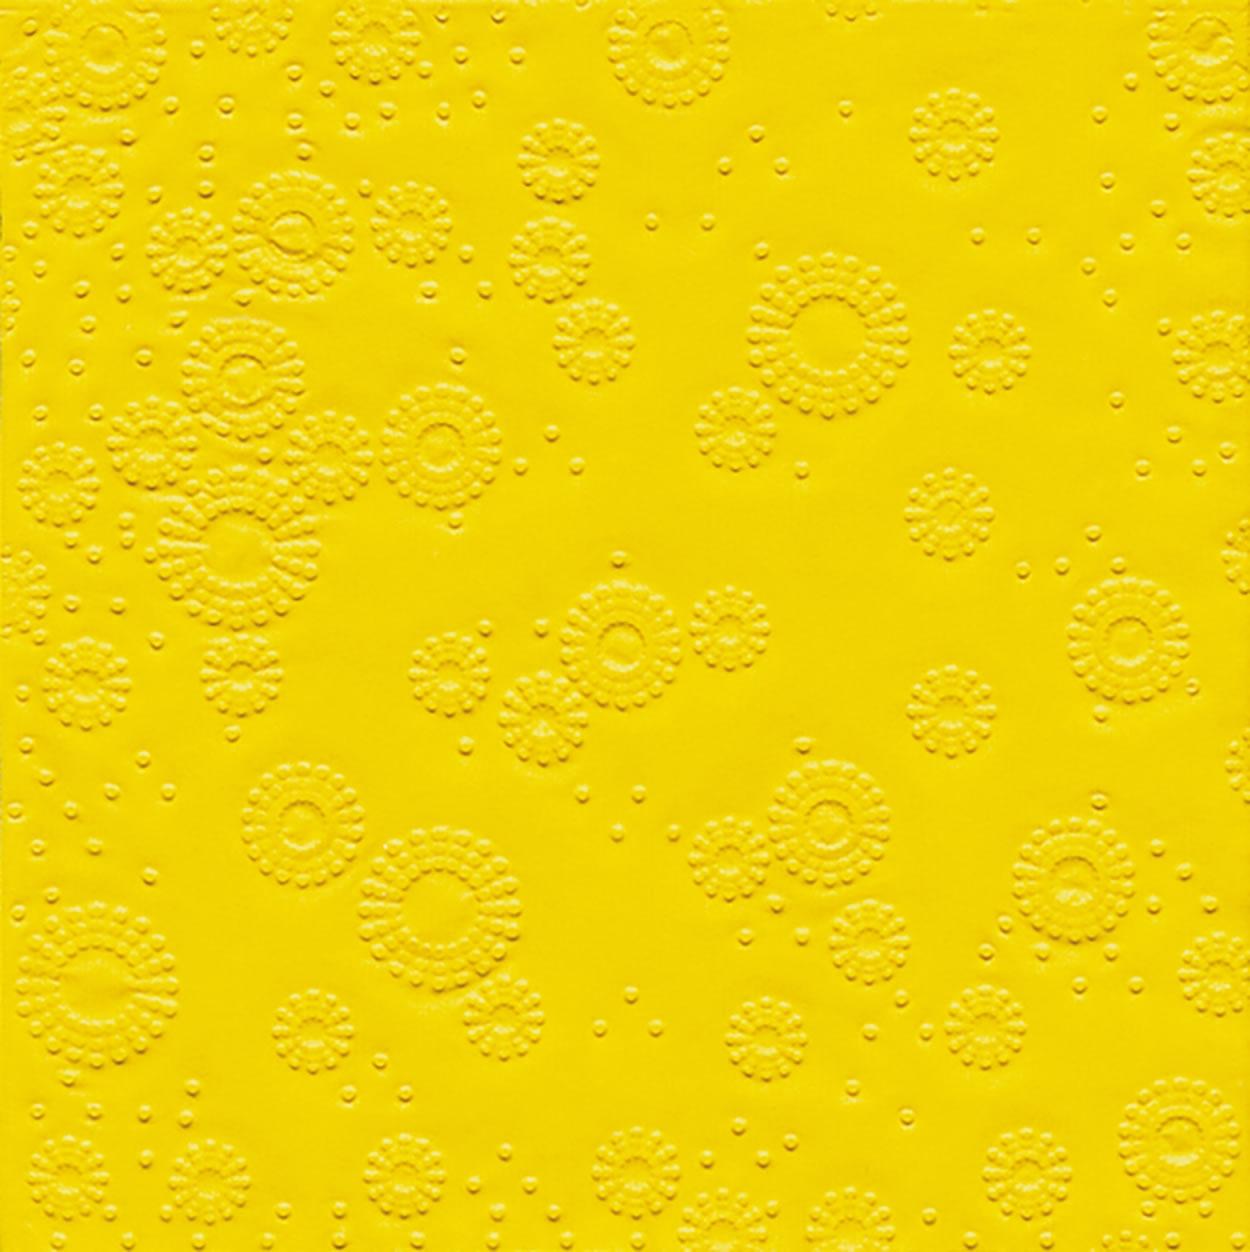 Lunch Servietten Moments Uni yellow - geprägt,   geprägte Servietten,   geprägte Servietten,  Everyday,  lunchservietten